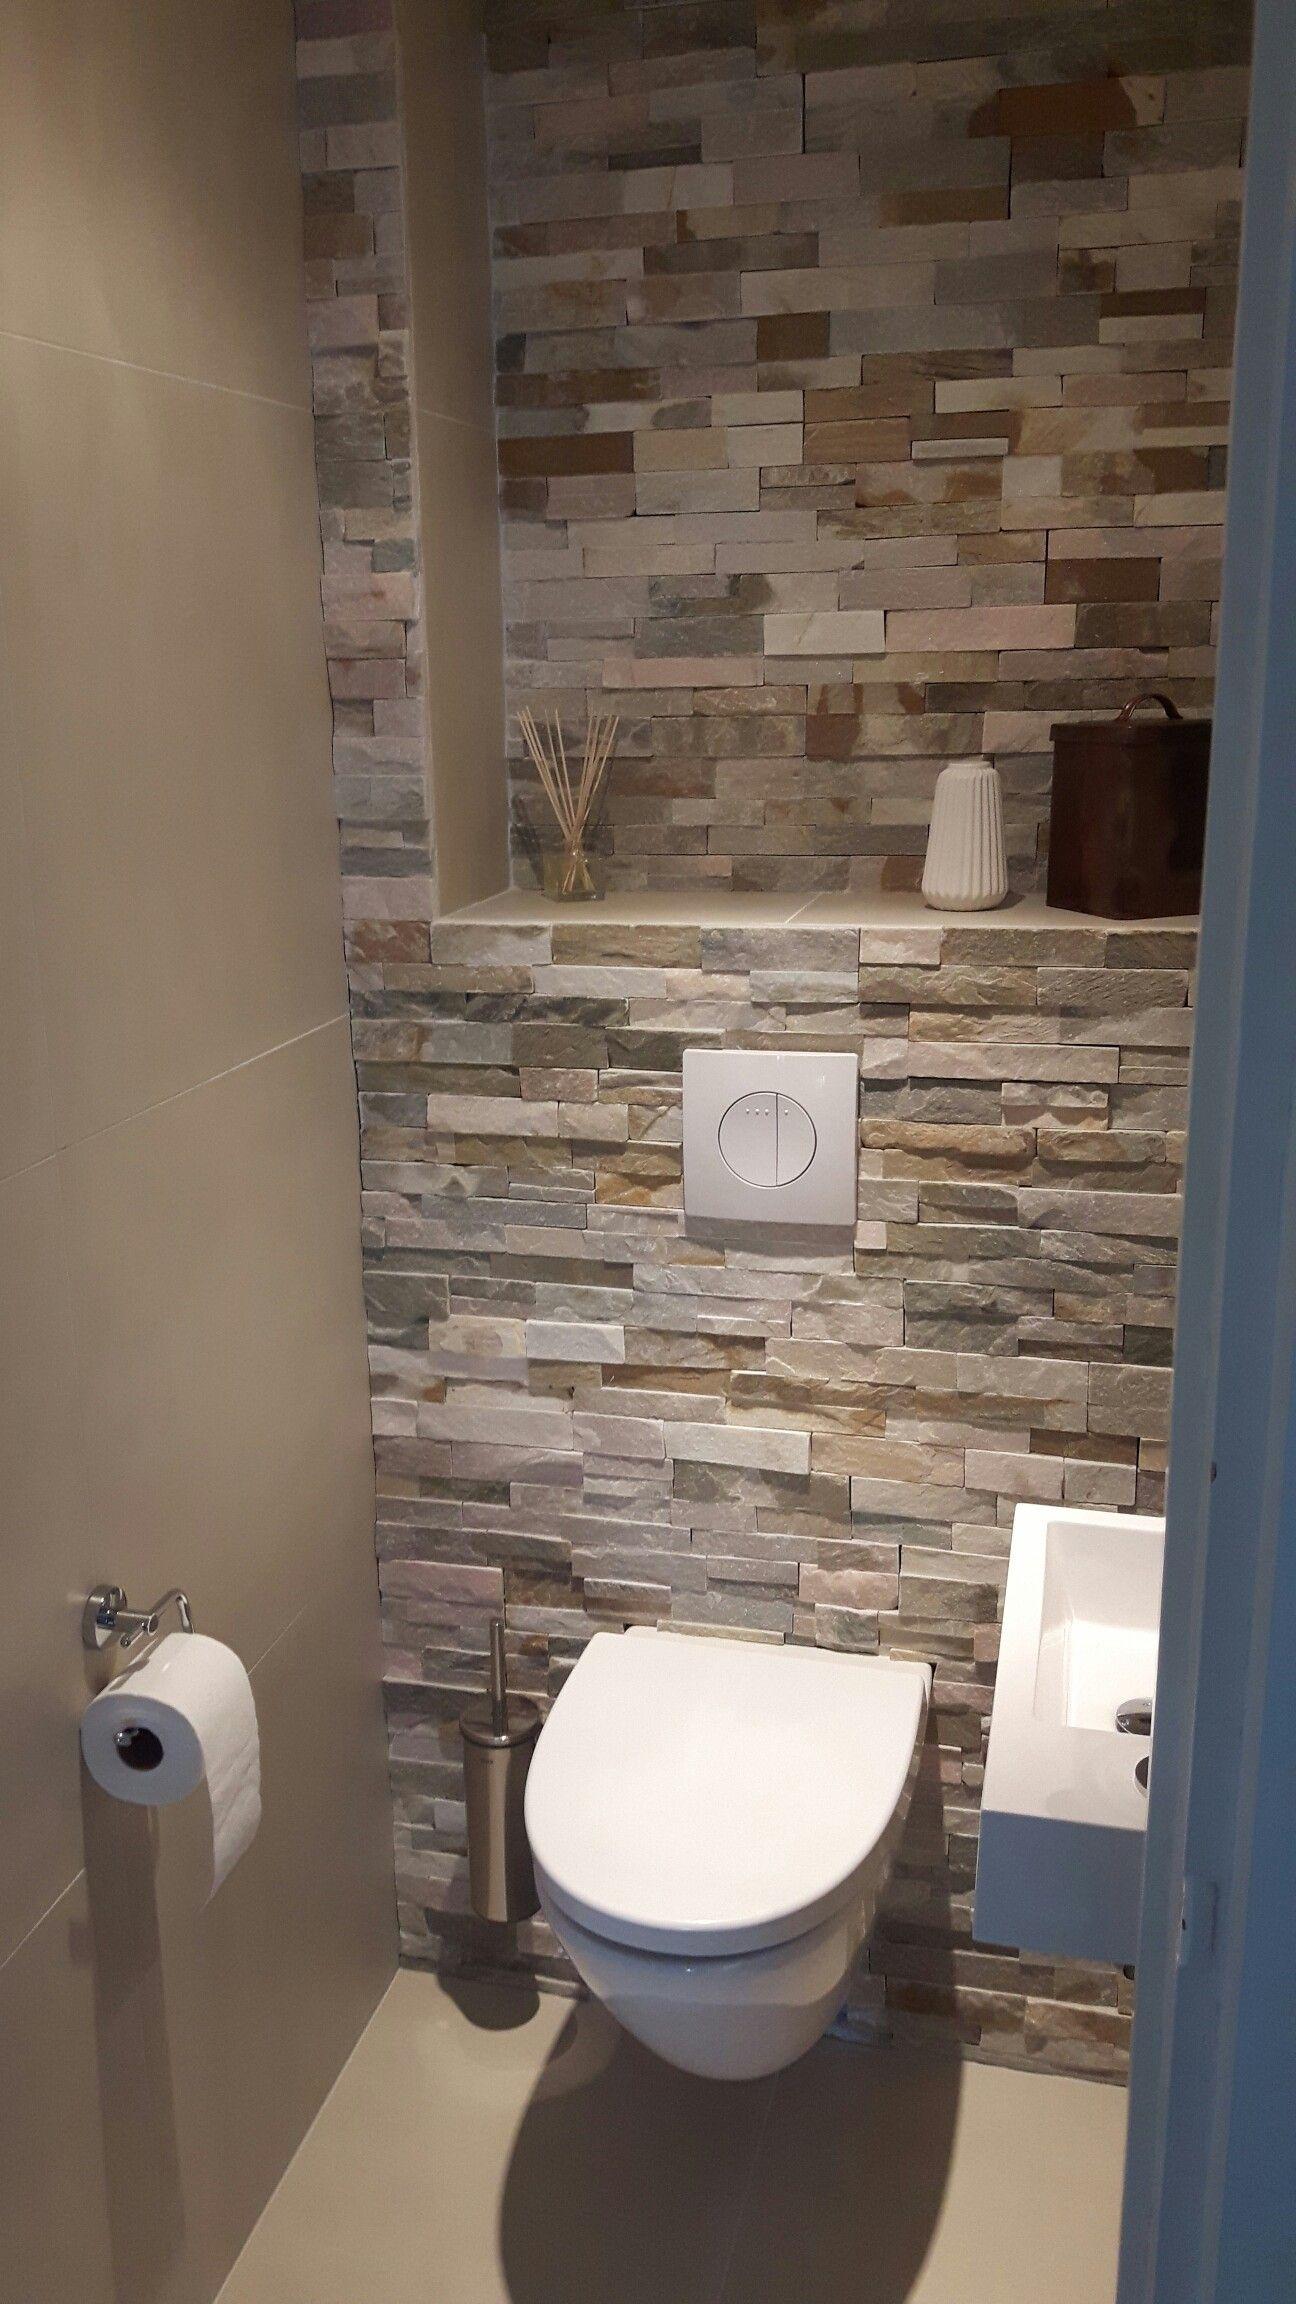 Toilet weer goed gelukt & Toilet weer goed gelukt | Home Design in 2018 | Pinterest | Bathroom ...